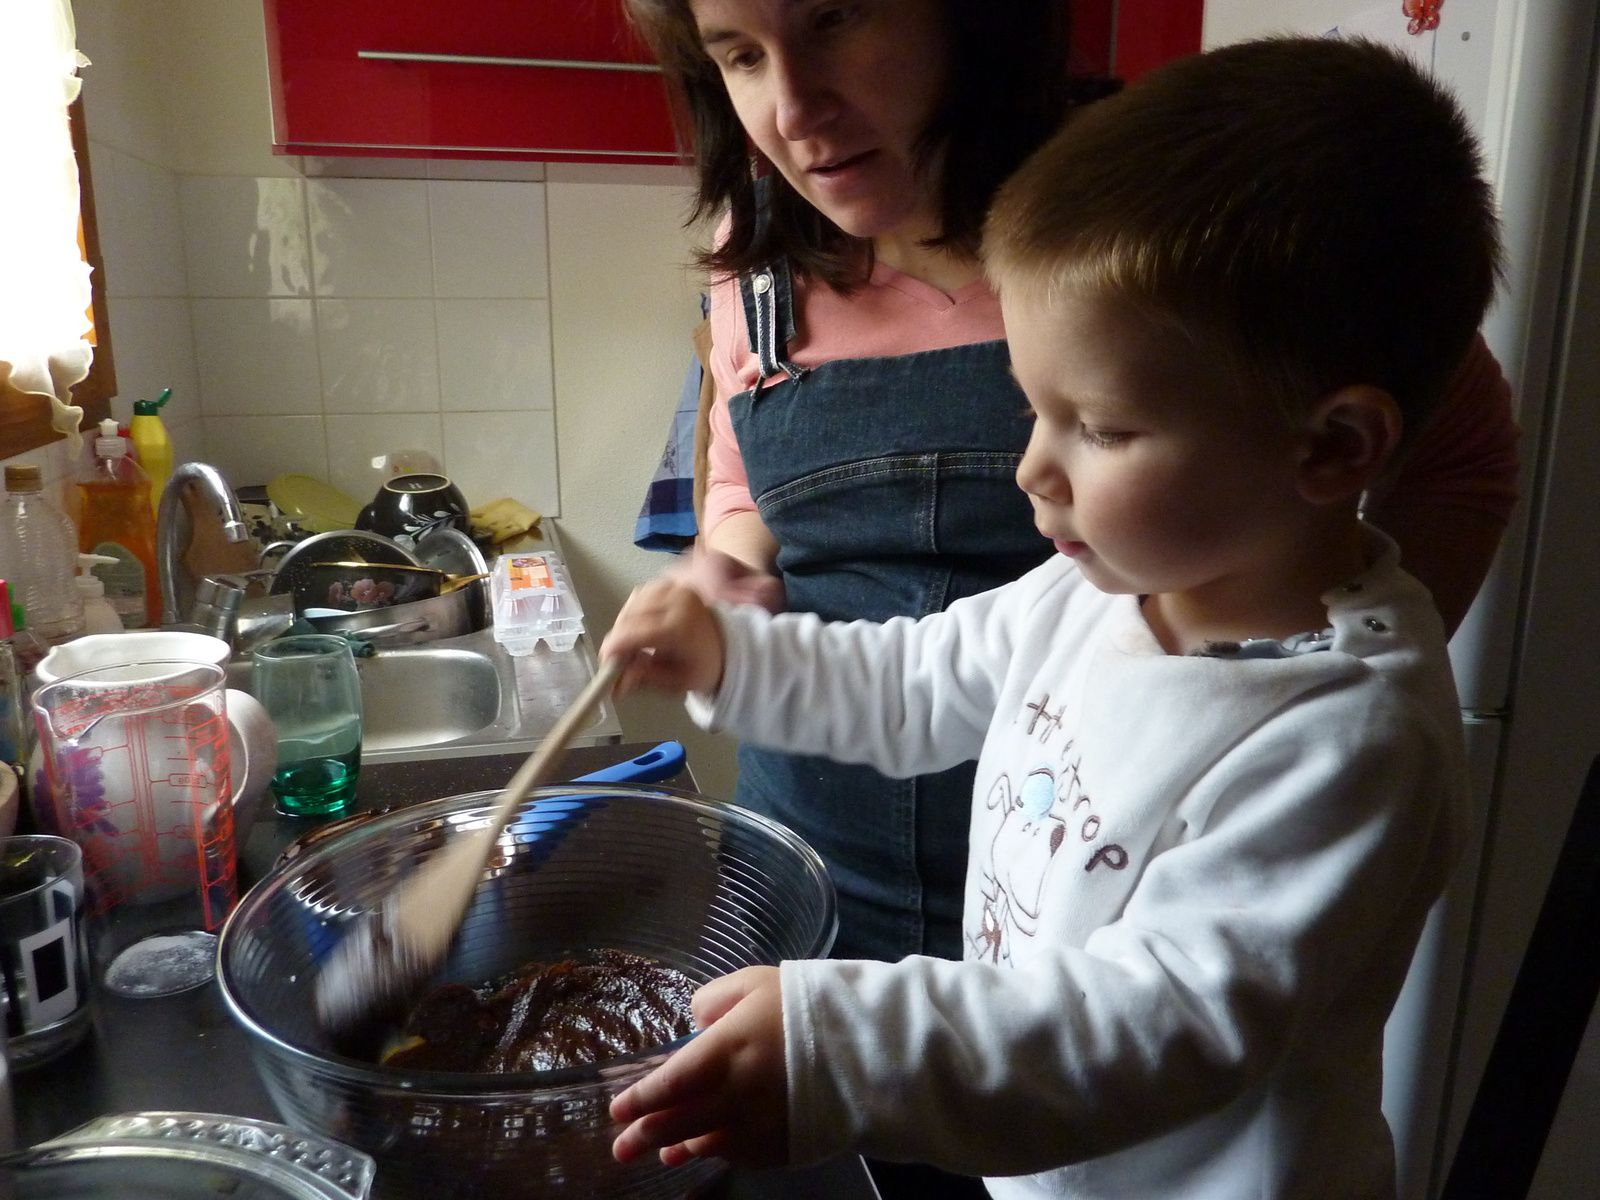 Aide cuisinier